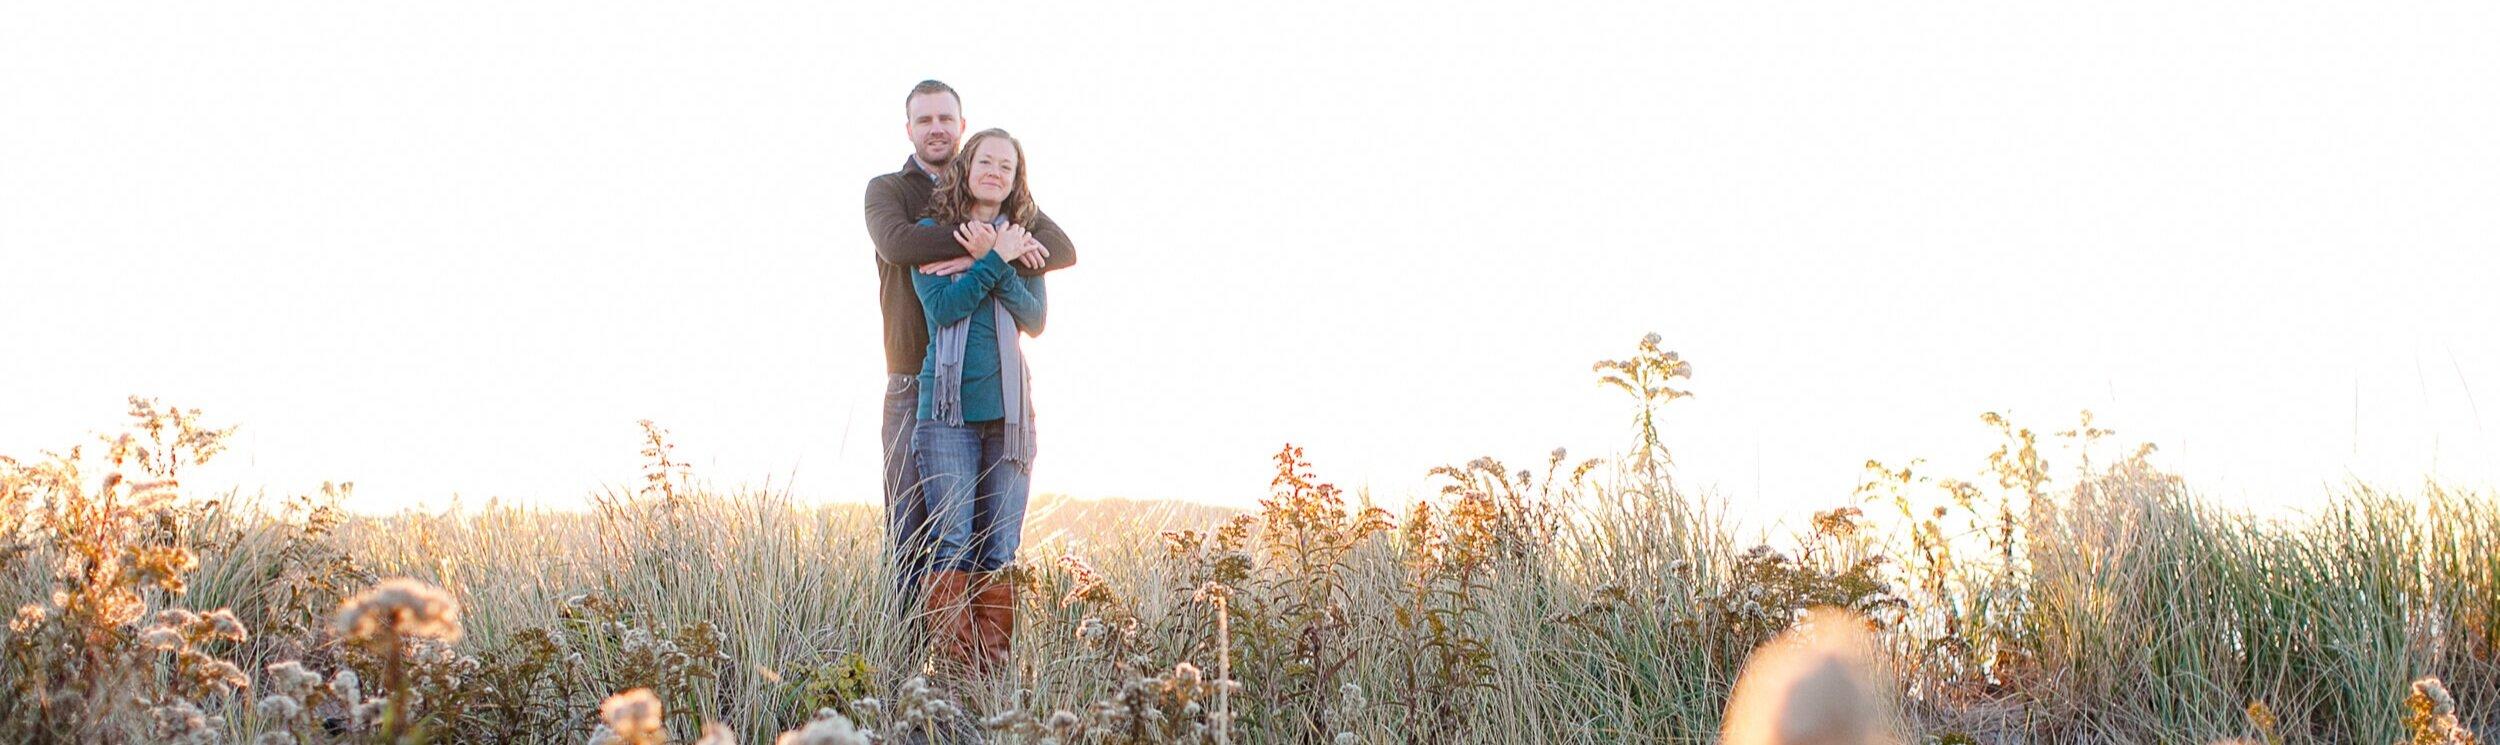 Andrew+and+Jill-54.jpg